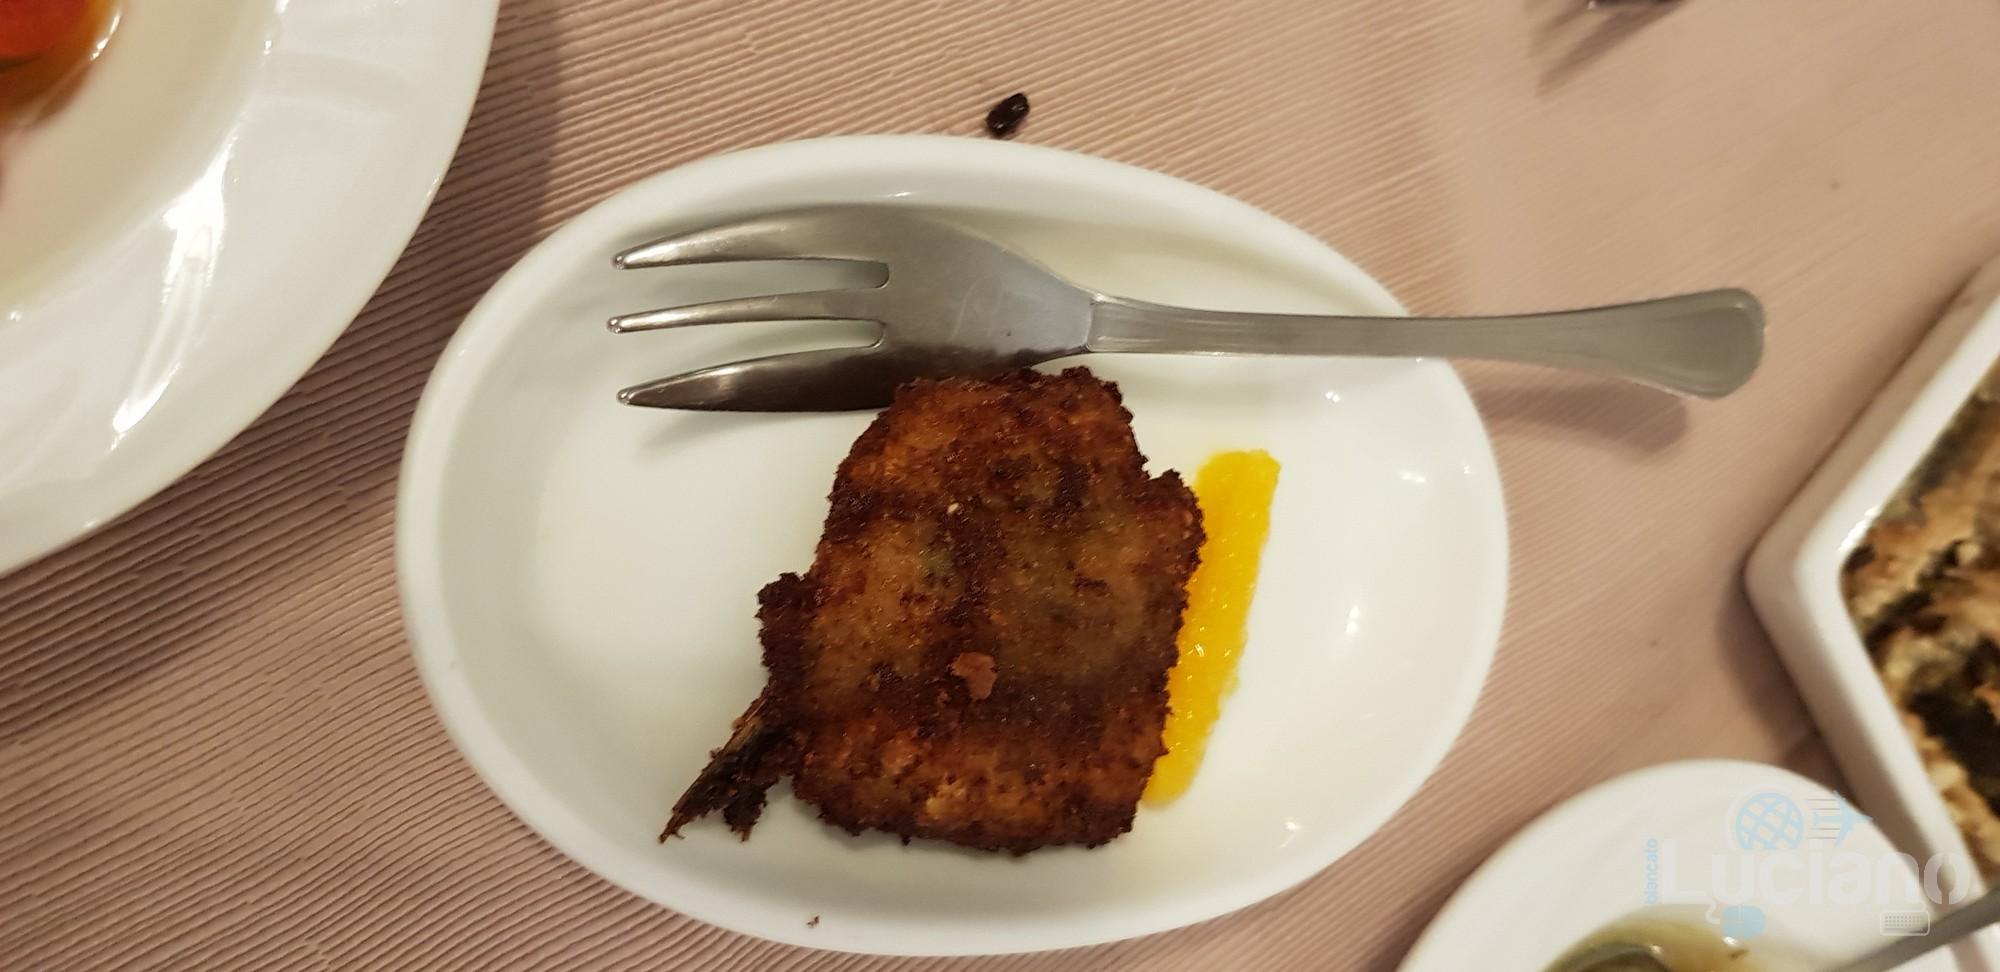 Trattoria Catania Ruffiana - Antipasti: polpetta sarde e beccafico